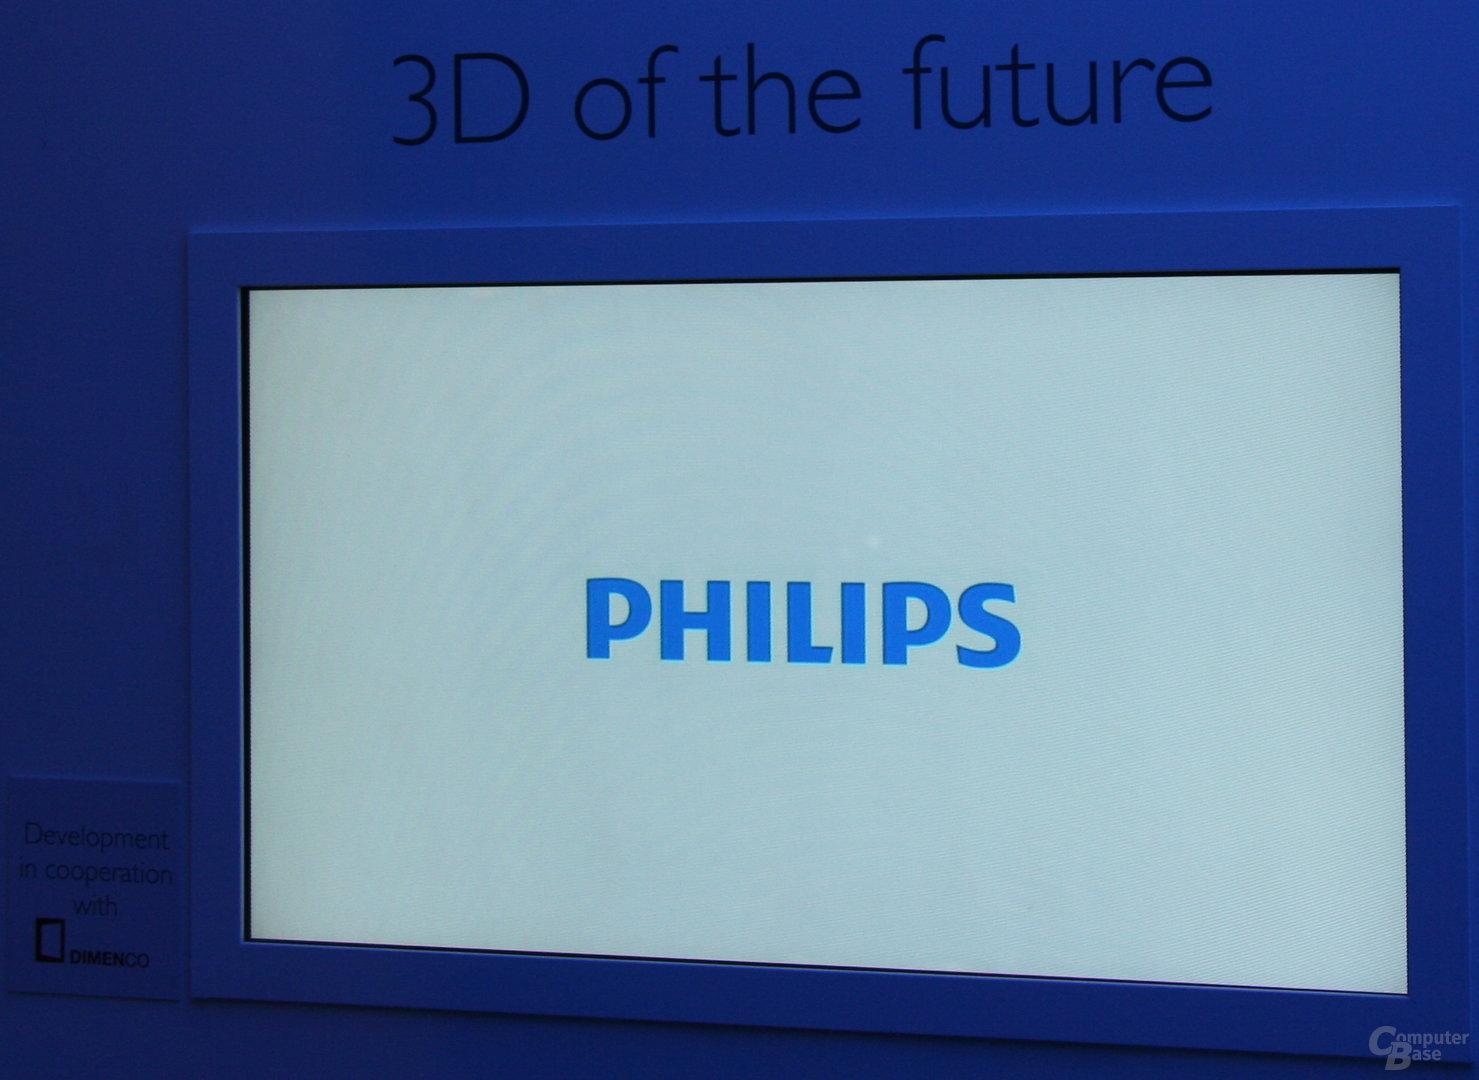 philips 3d fernseher ohne brille bild 5 5 computerbase. Black Bedroom Furniture Sets. Home Design Ideas